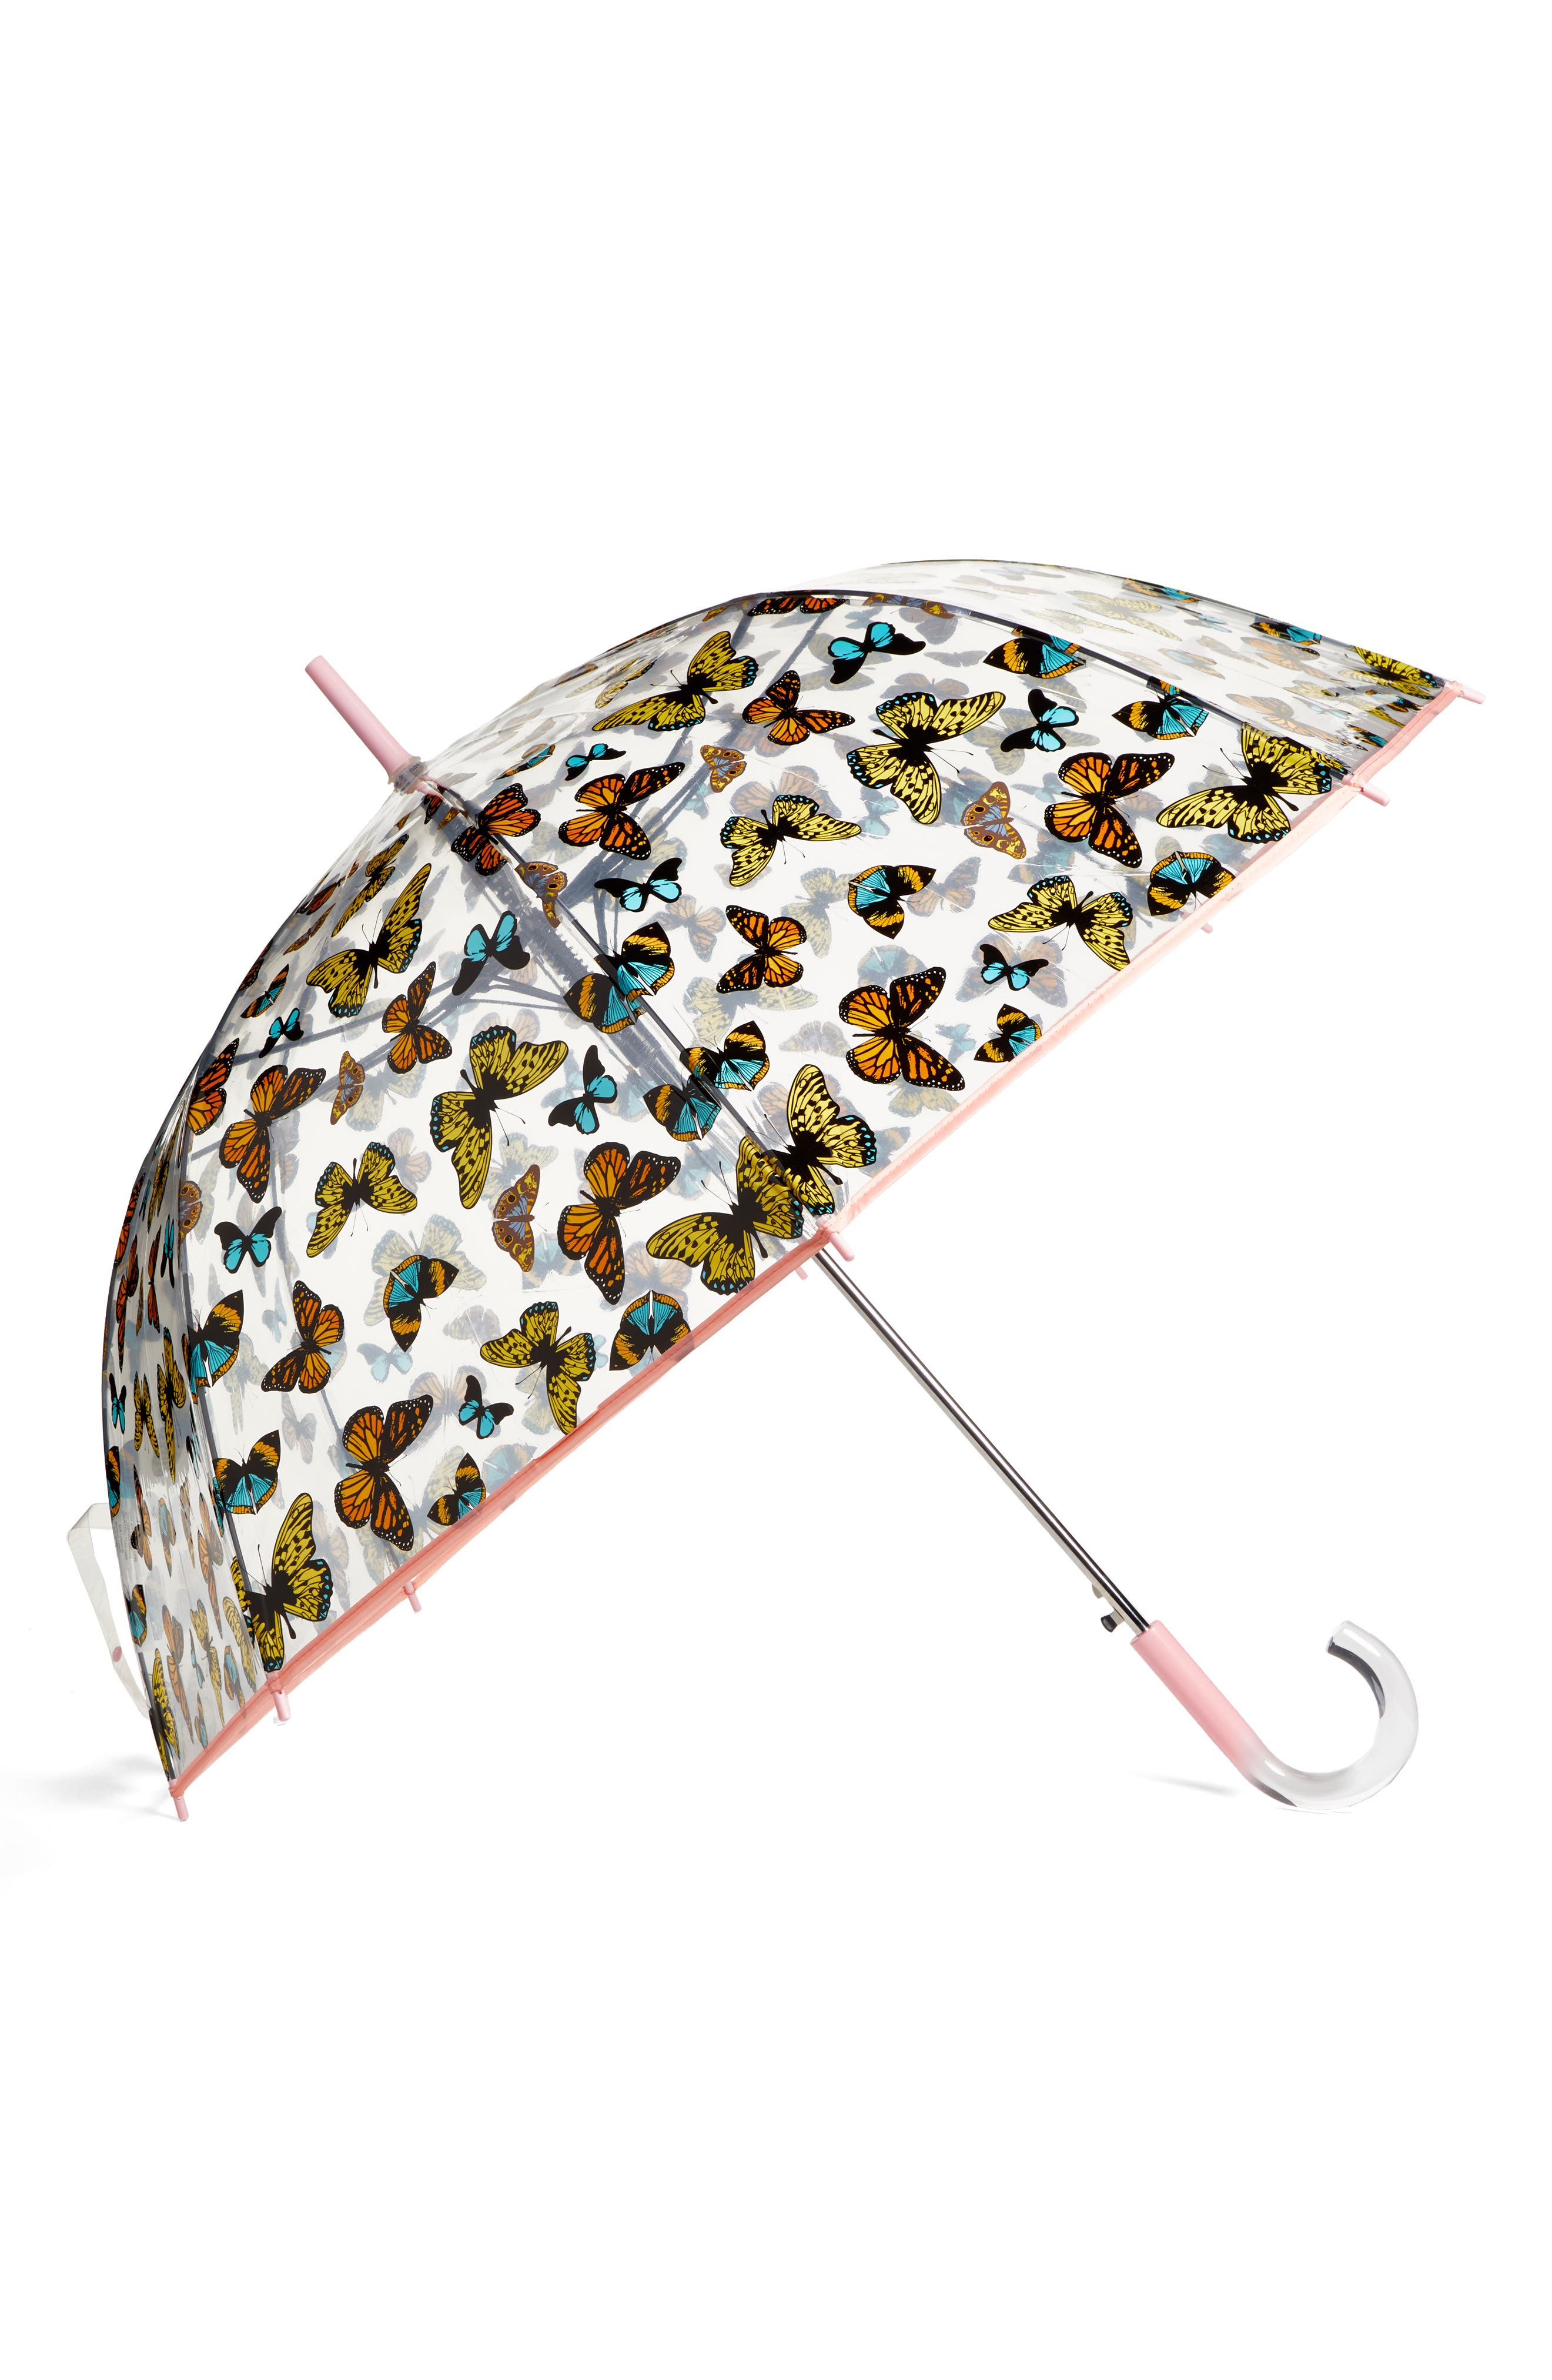 'The Bubble' Auto Open Stick Umbrella,                             Main thumbnail 1, color,                             Nord Butterfly